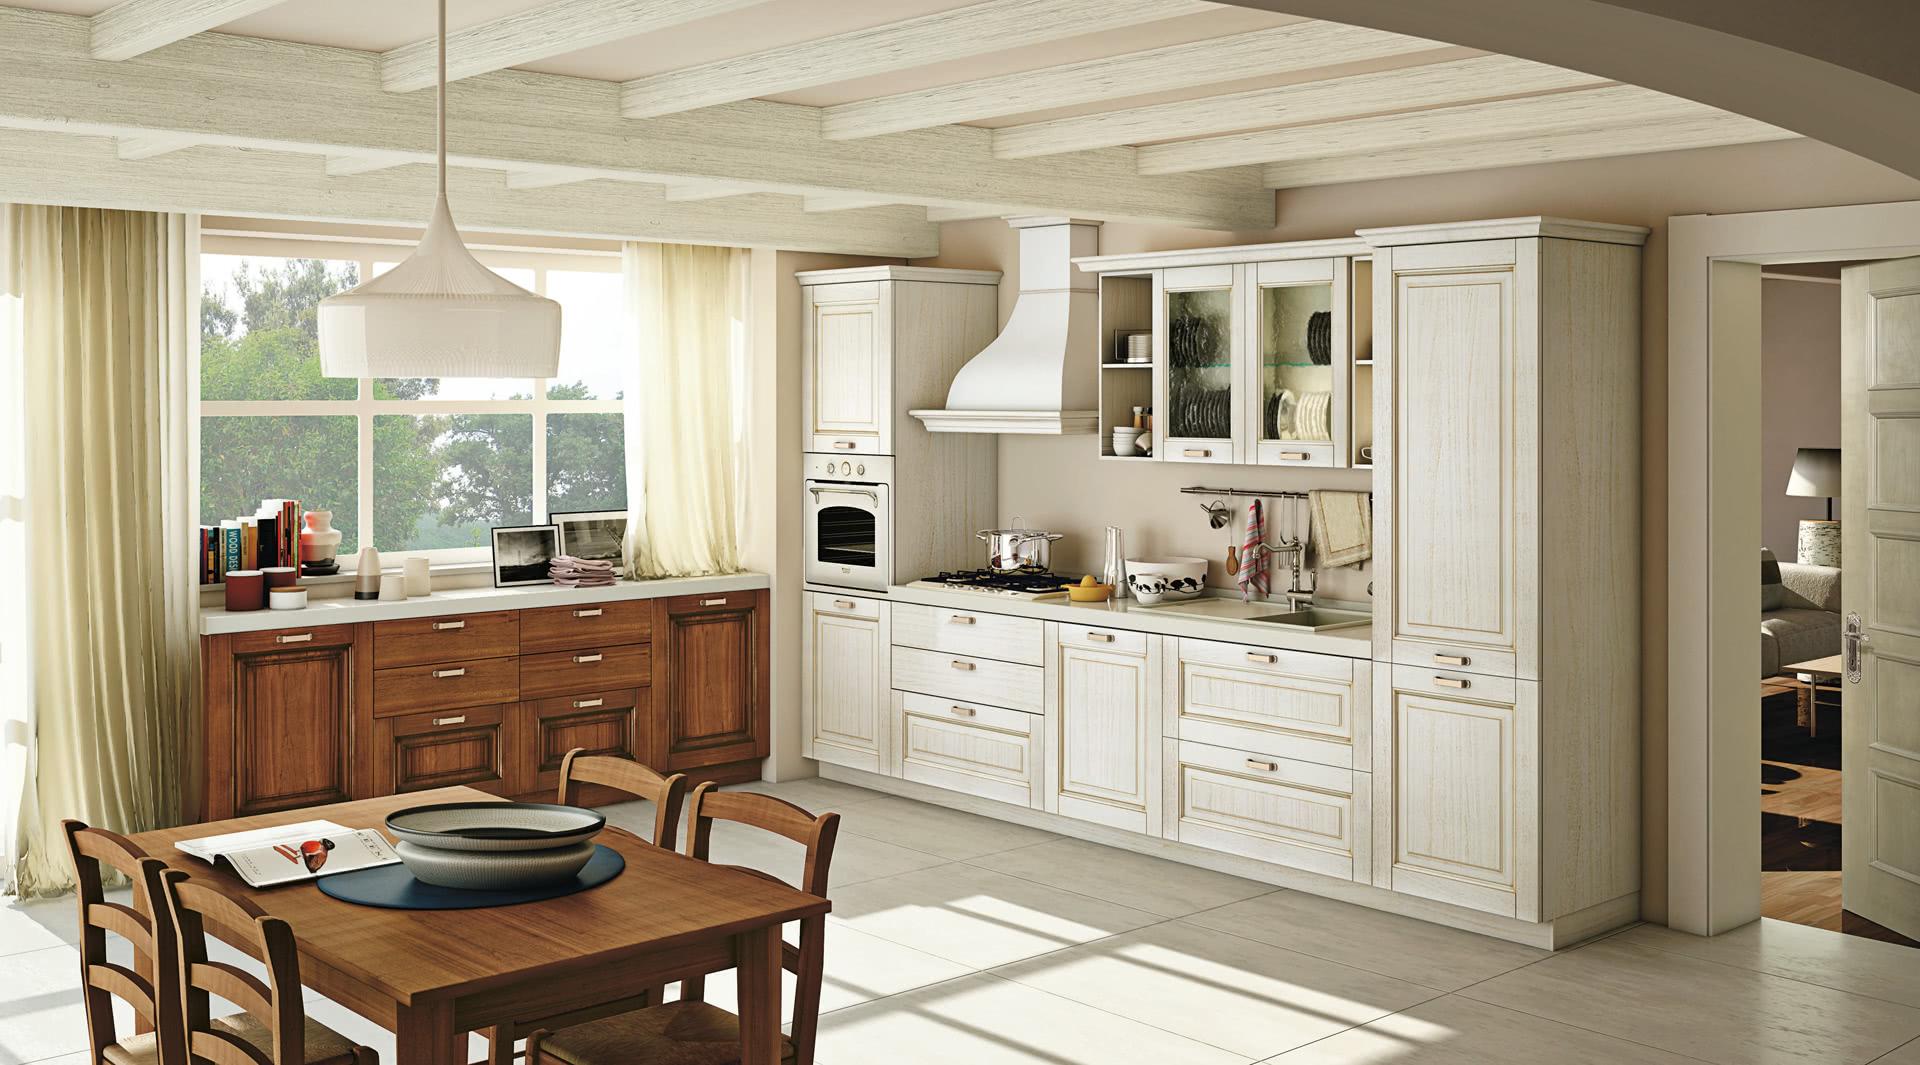 2567_oprah-cucina-ambientata-3